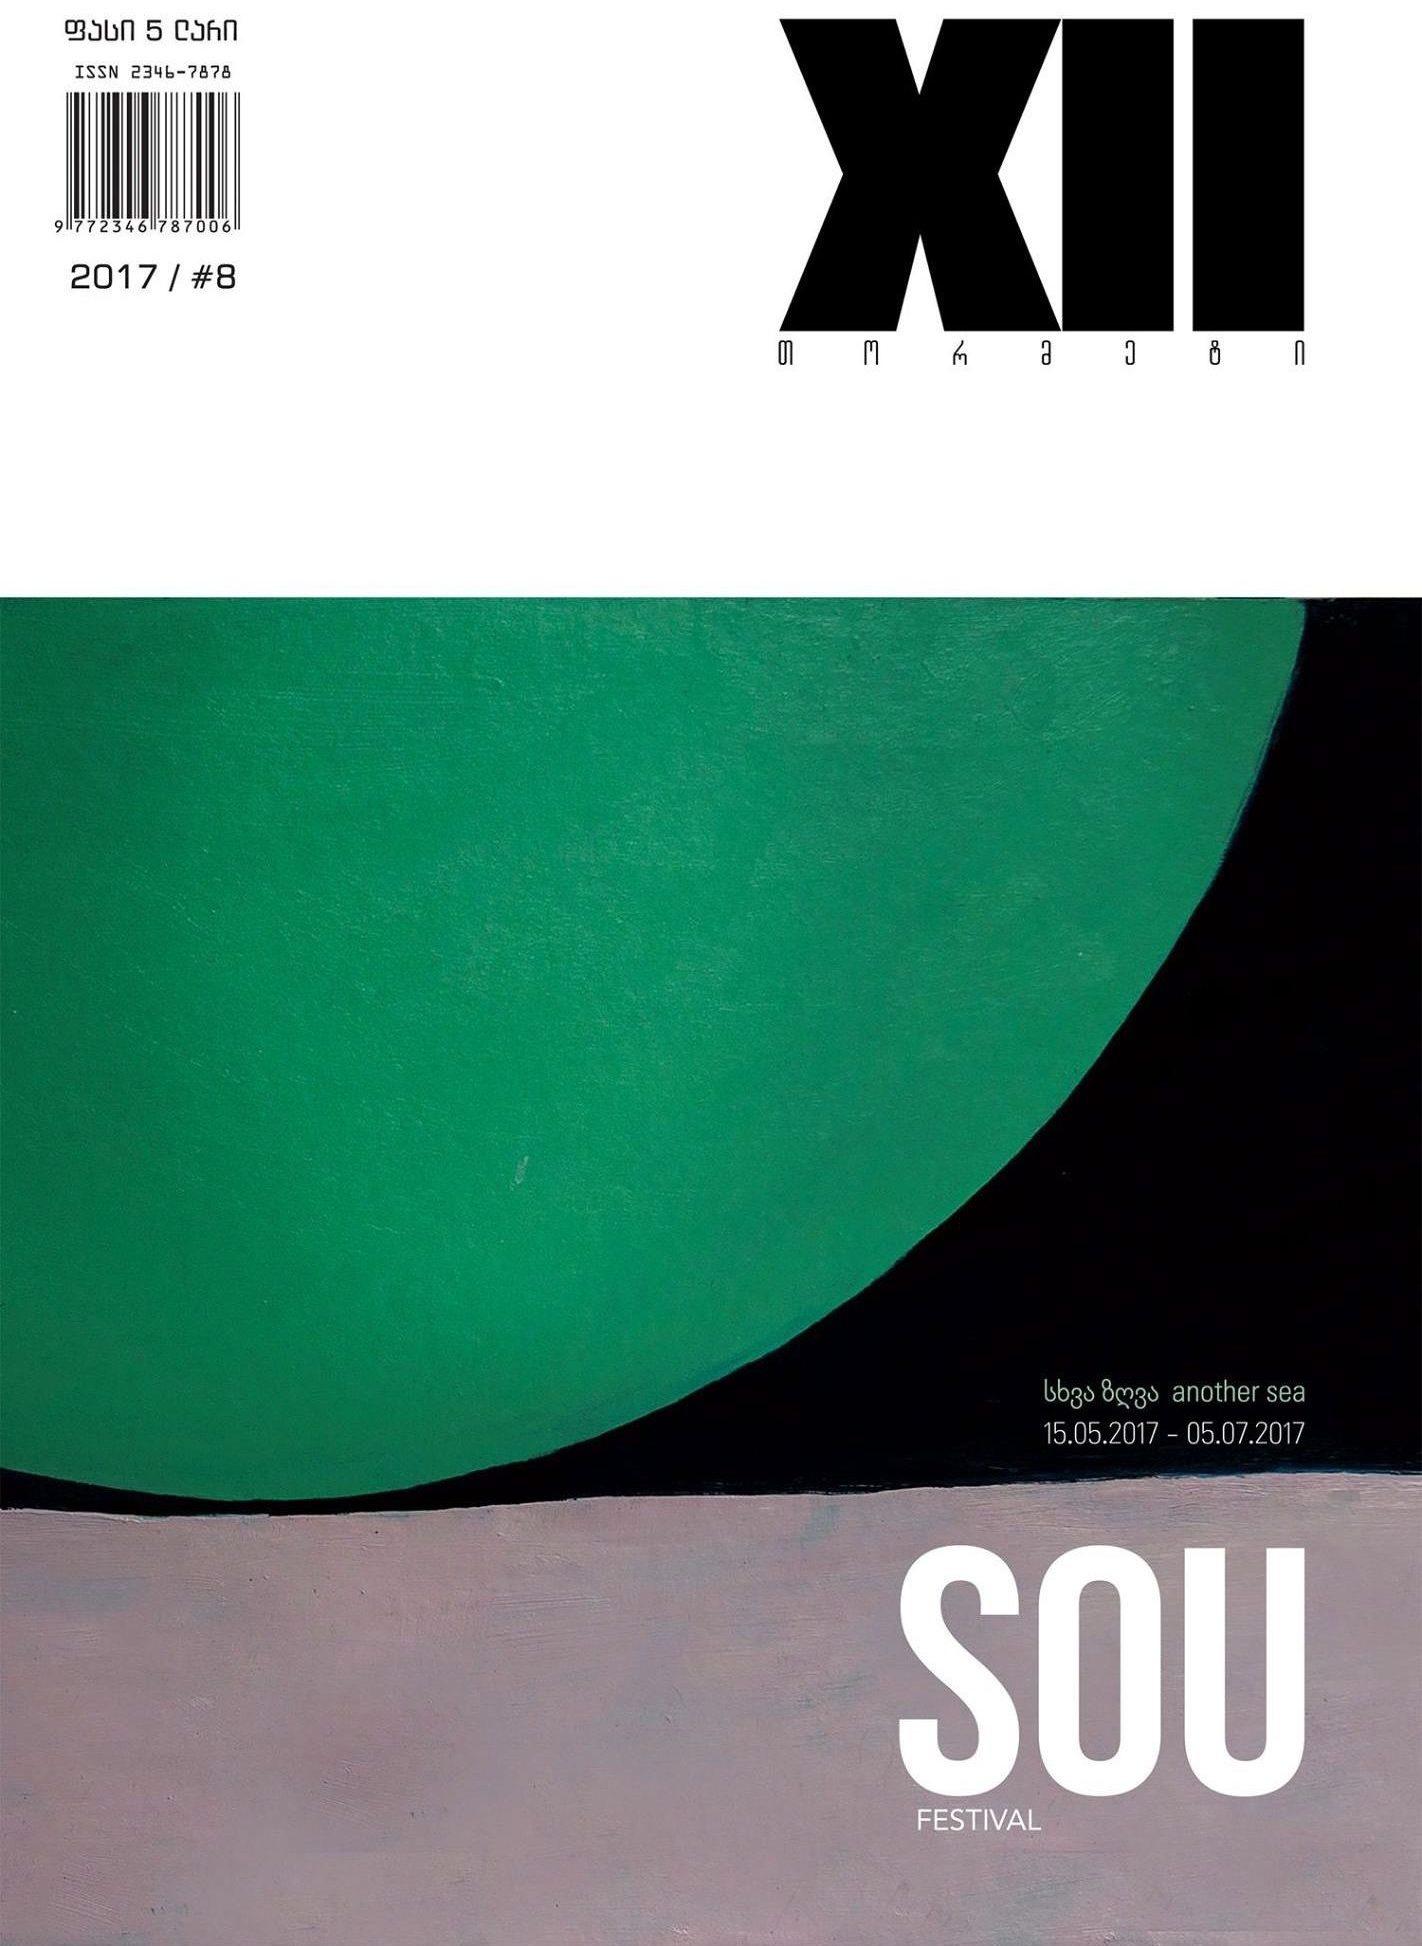 Tormeti - Magazine Cover